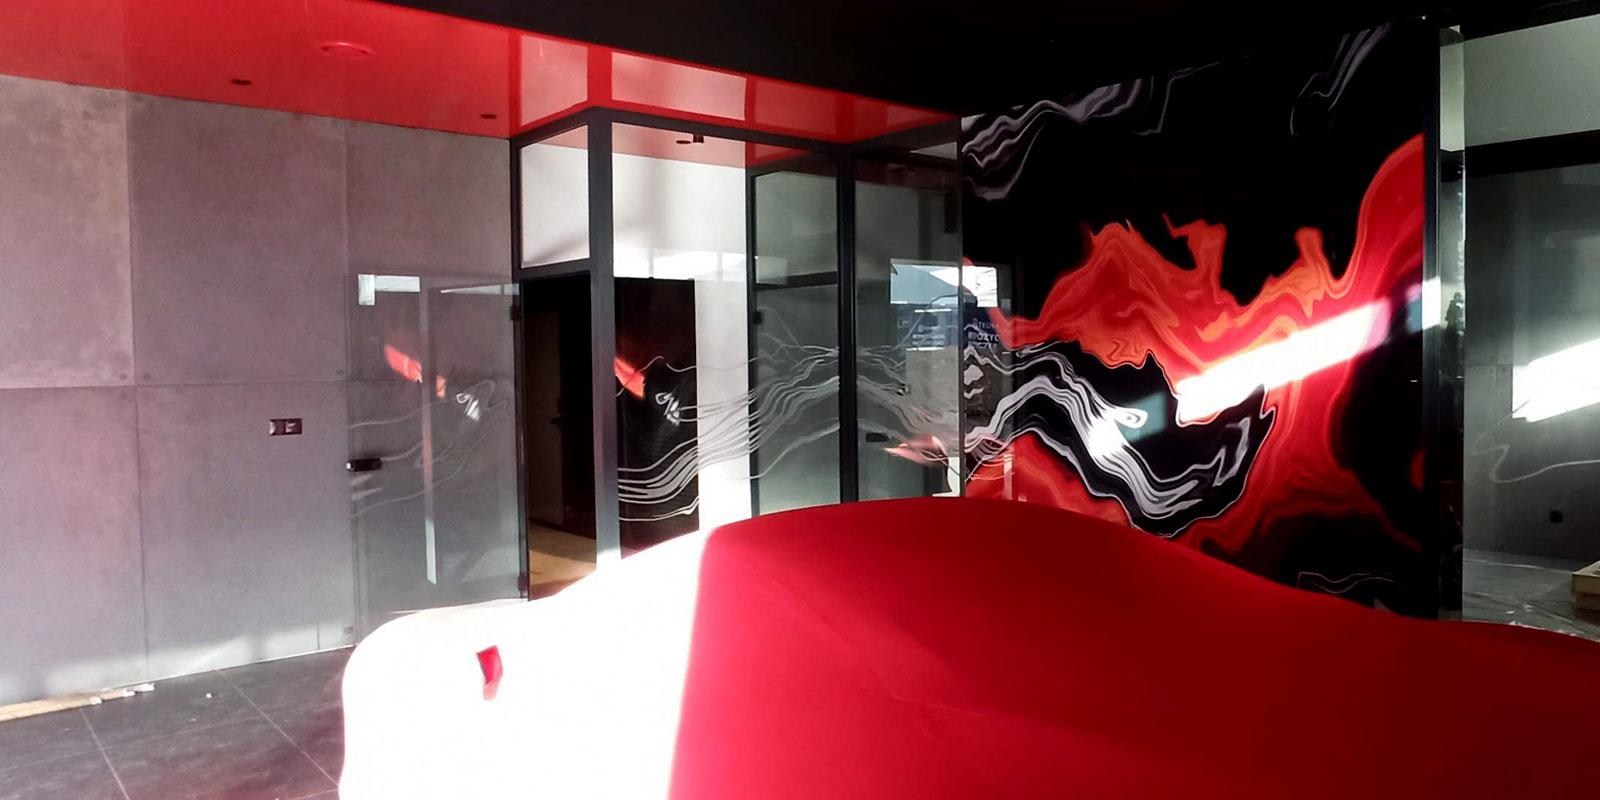 luxury garage red ceiling and ferrari